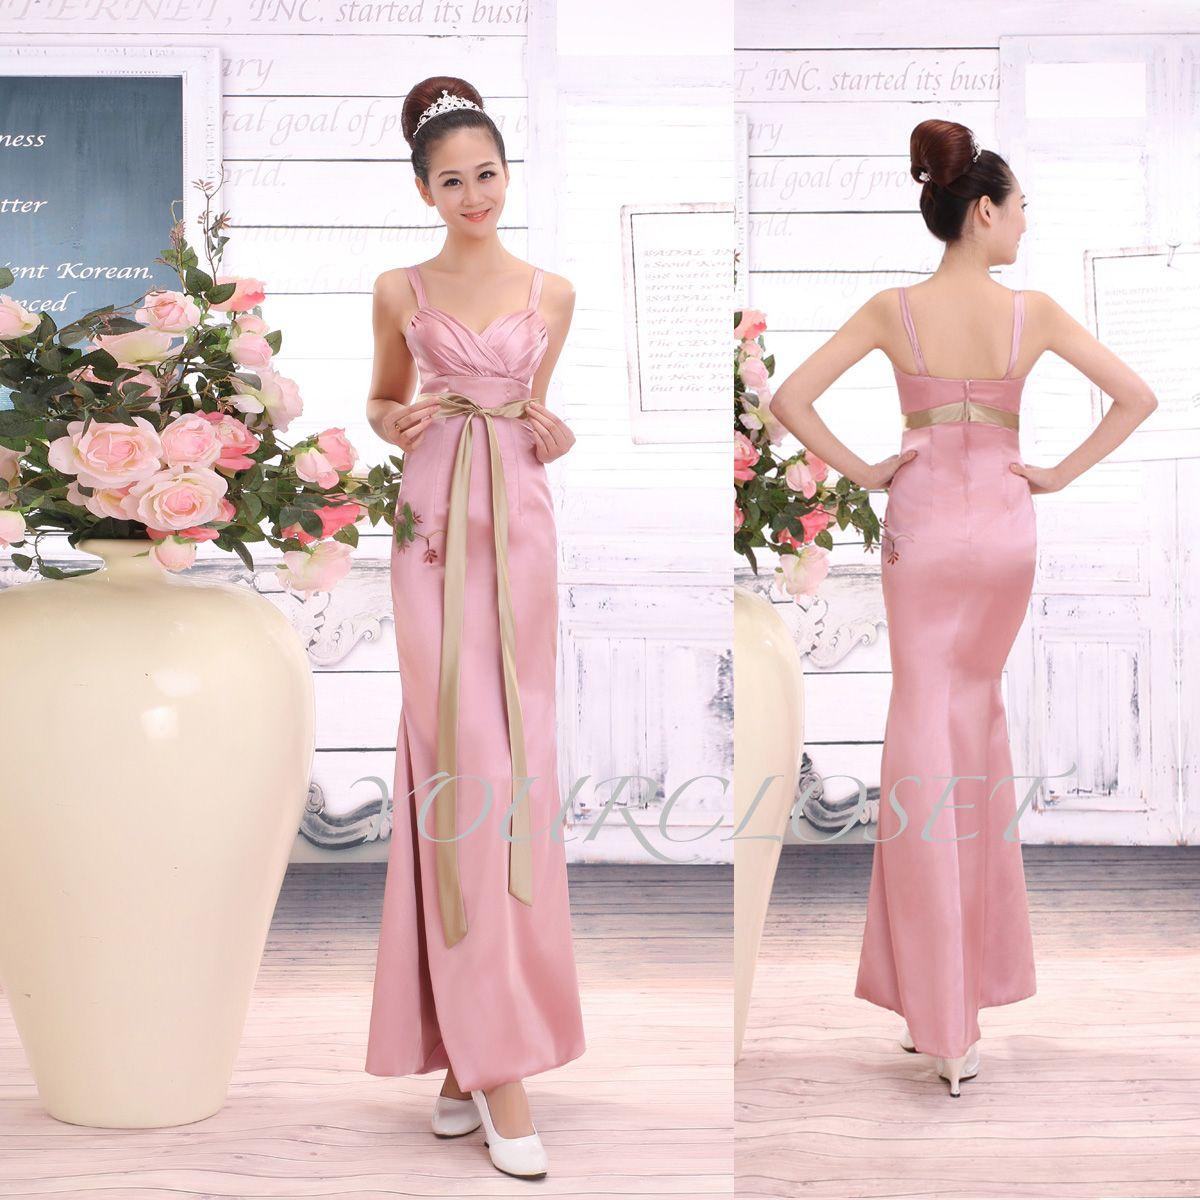 Elegant satin halter prom dress #pink #prom #bridesmaid #dress ...